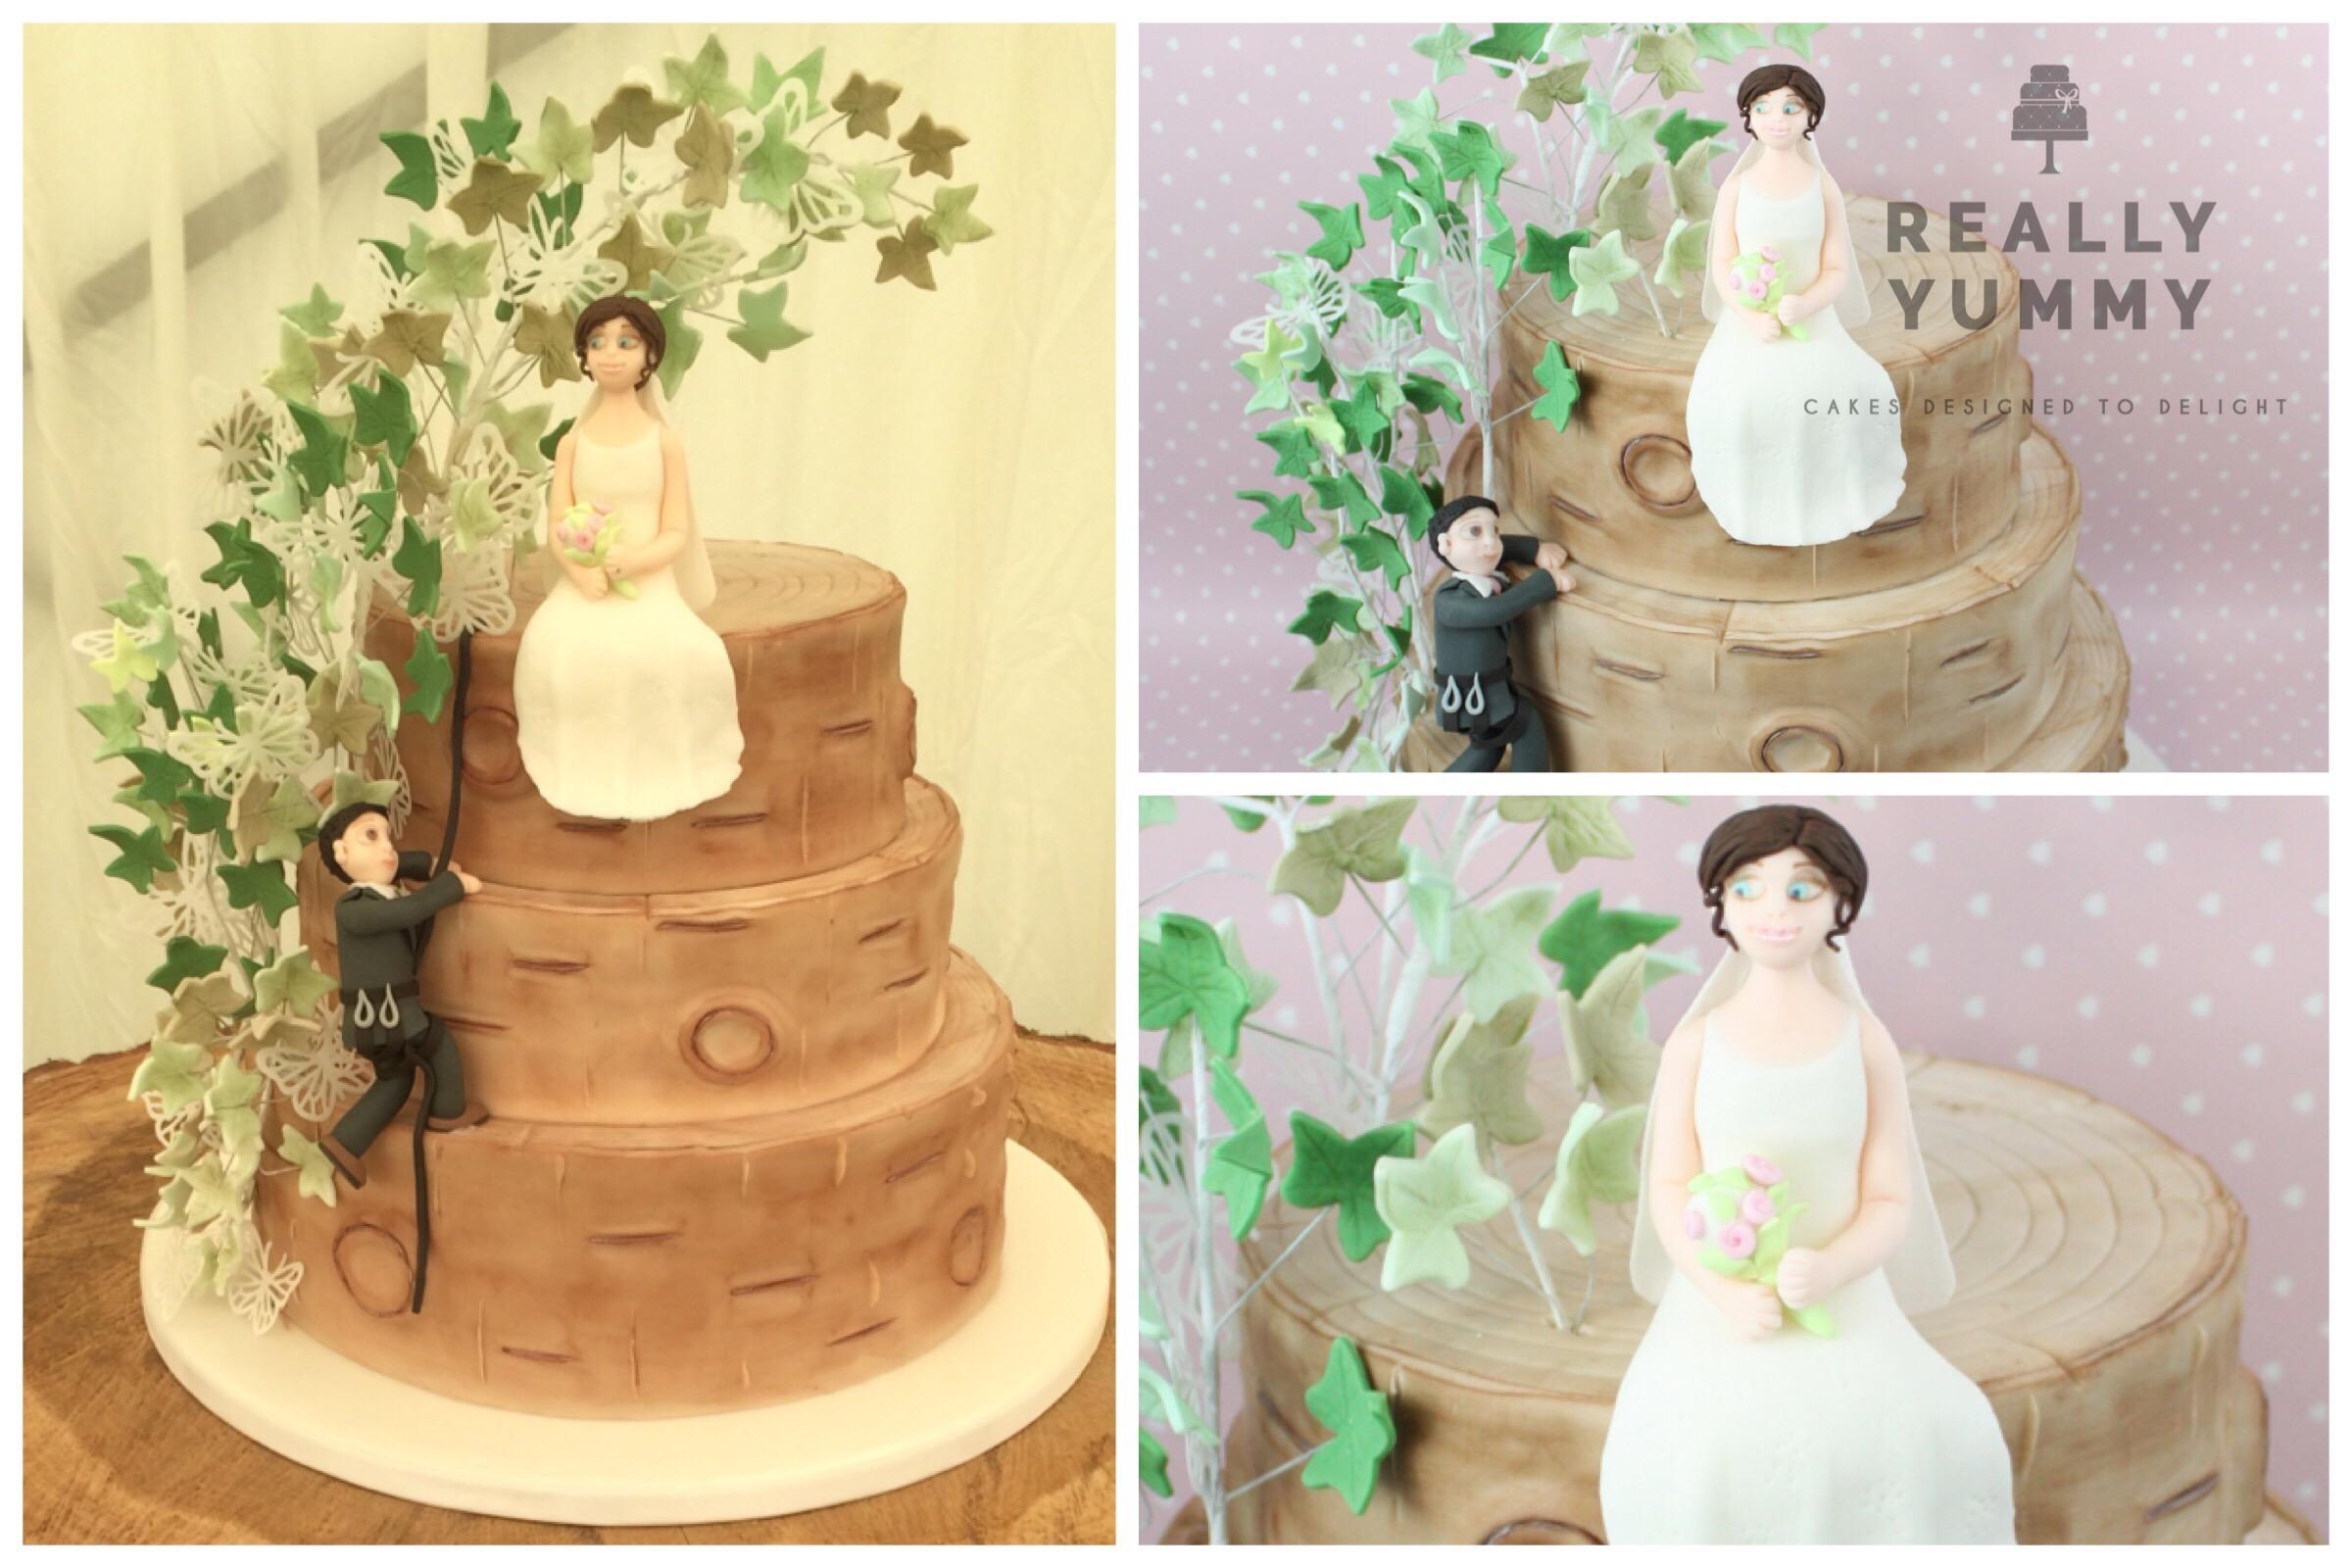 Tree surgeon's wedding cake